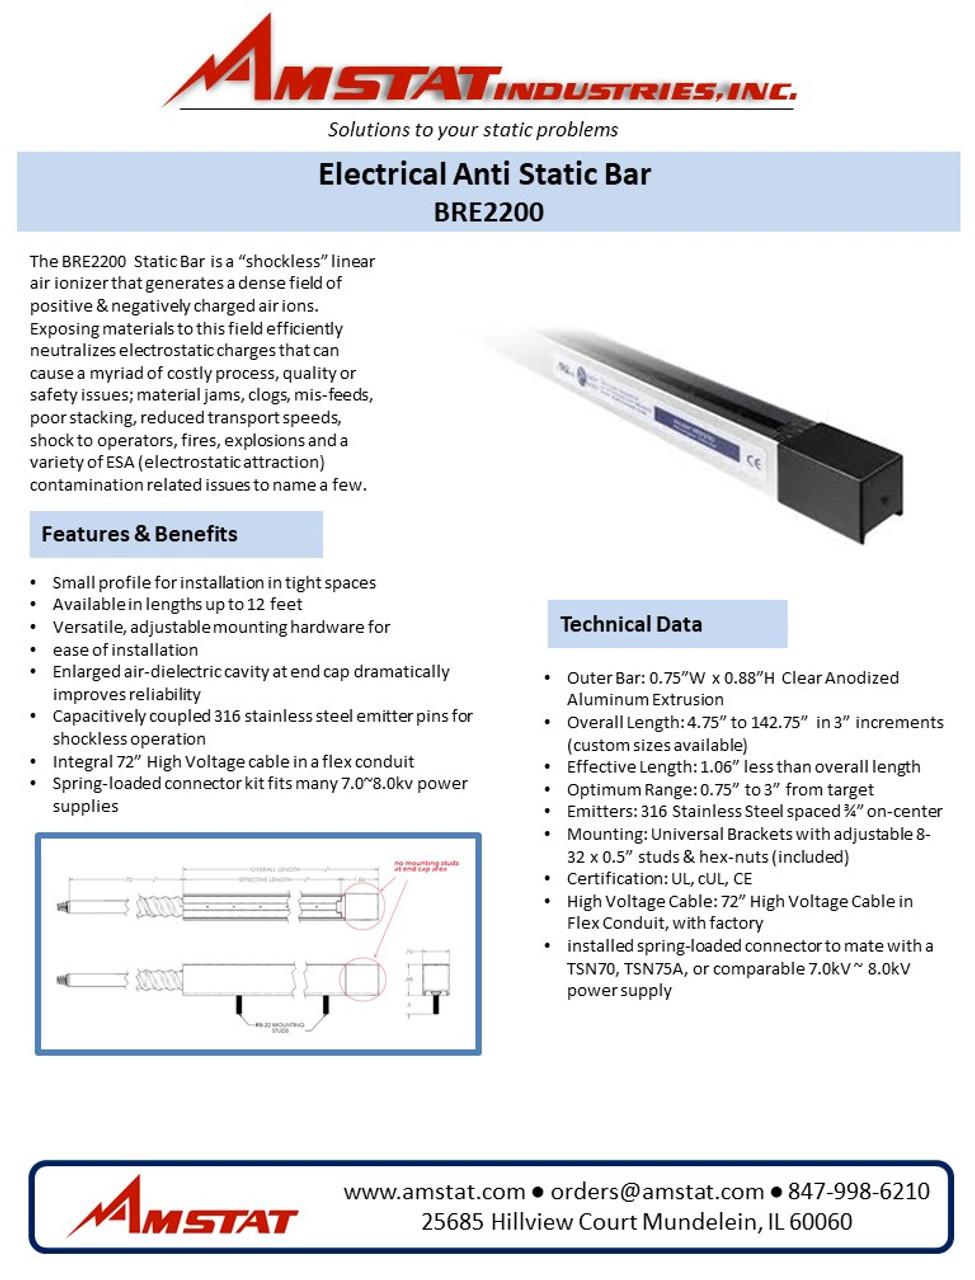 Electrical Anti Static Bar - Static Control Bar BRE2200